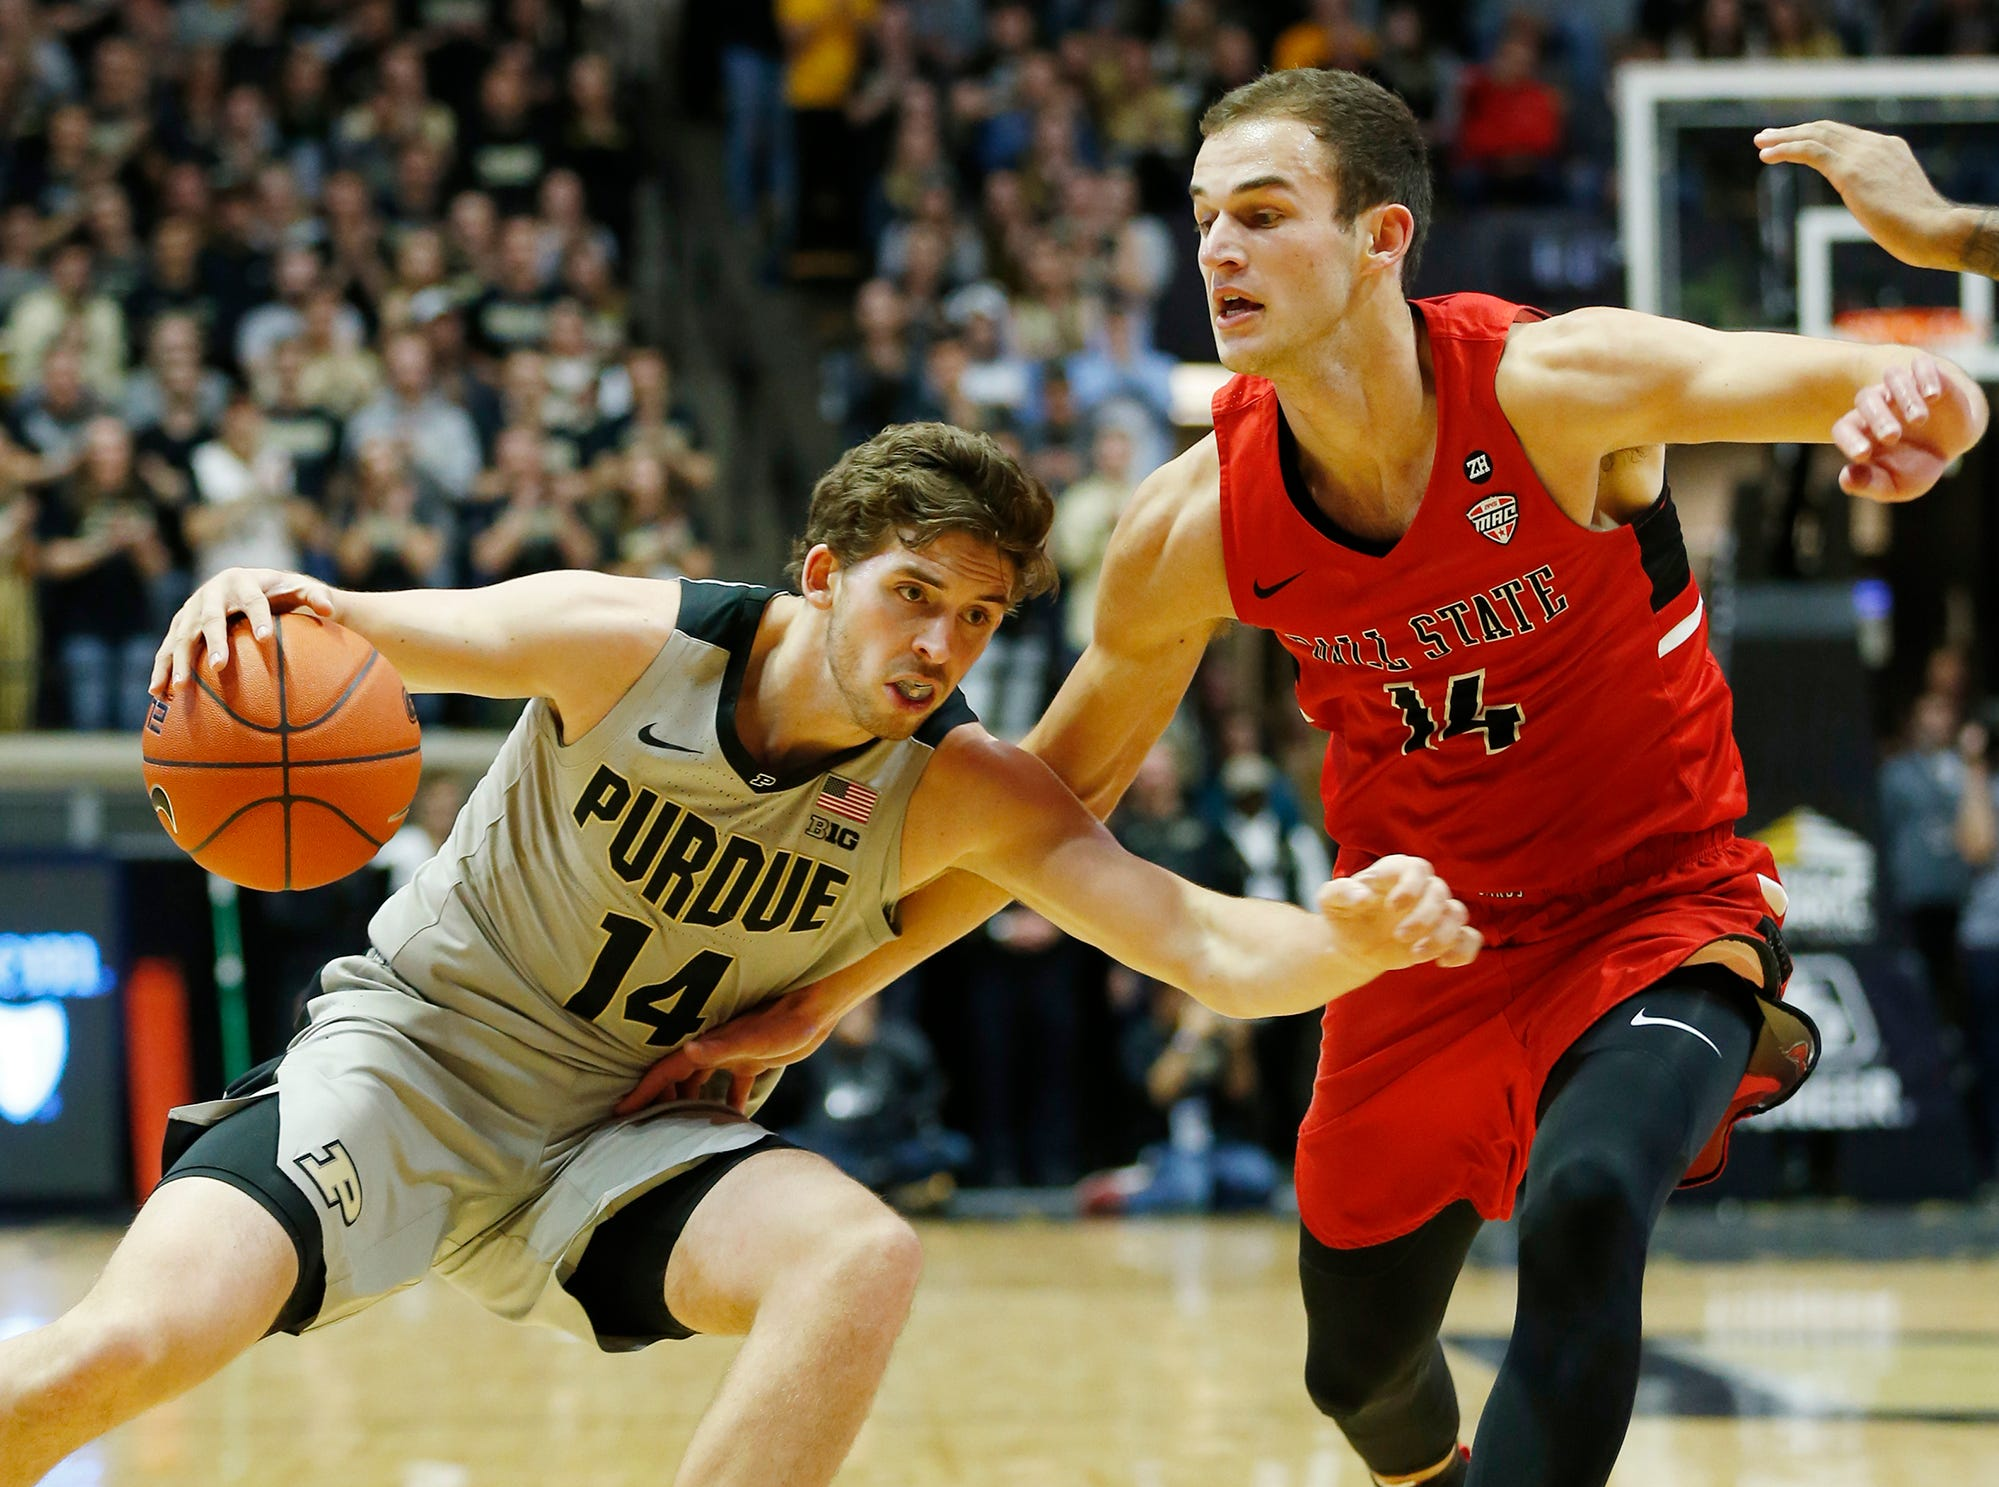 Purdue basketball pregame vs. Appalachian State at Charleston Classic